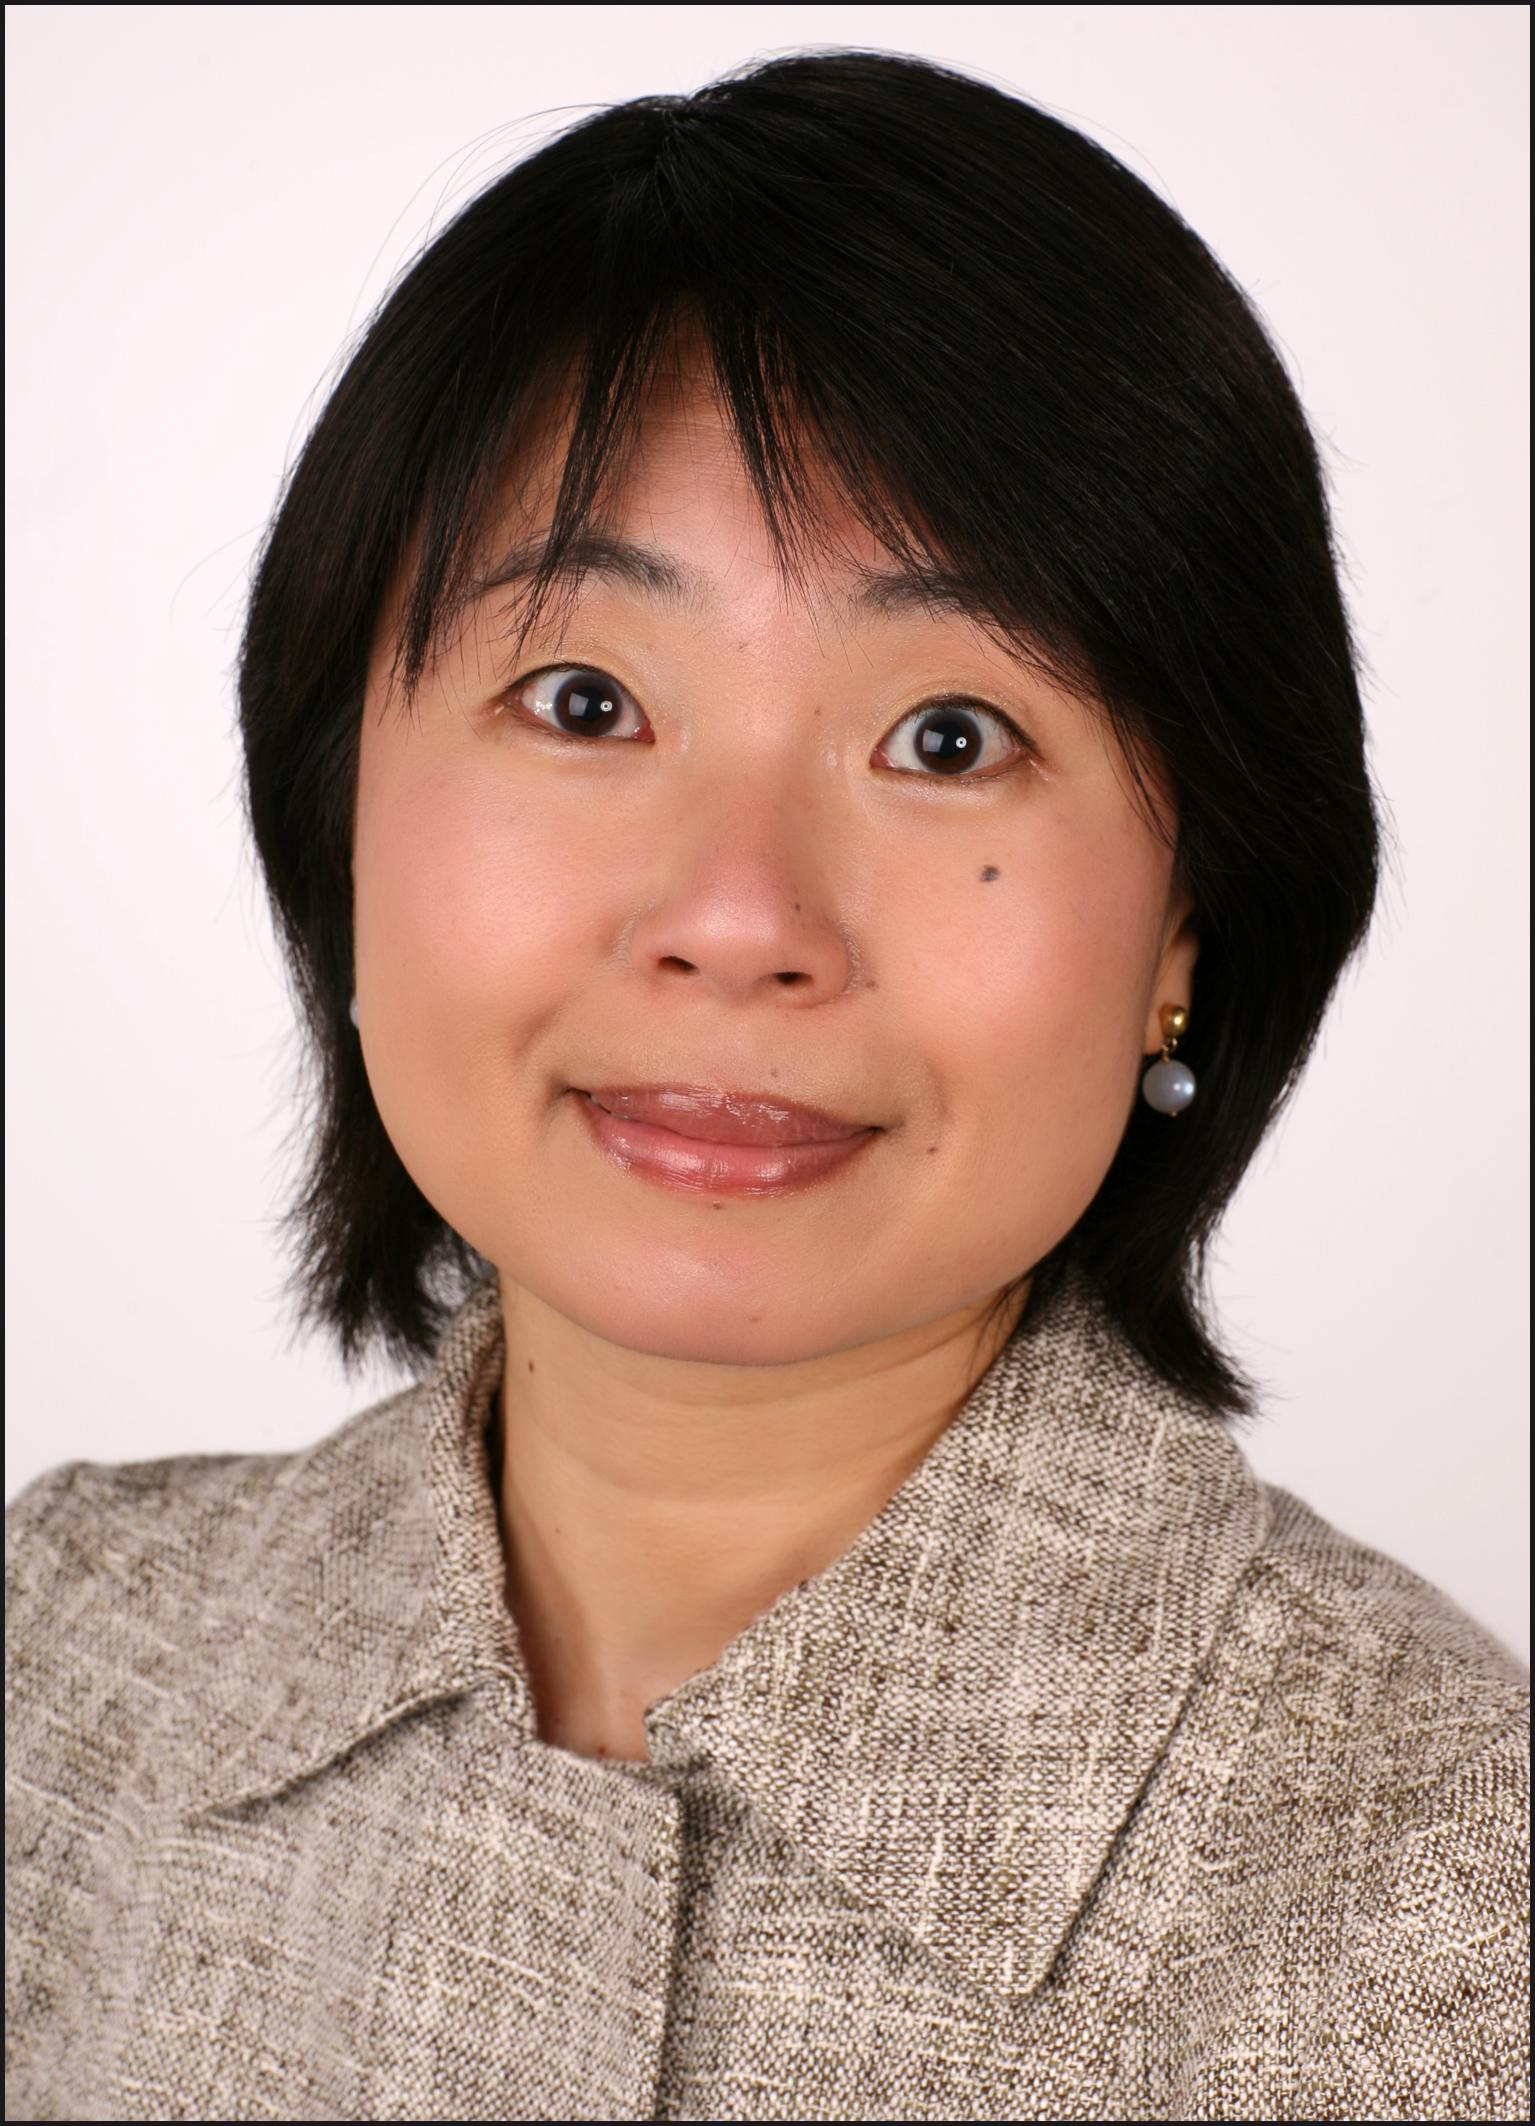 <b>Ayako Yamamoto</b>, Ph.D. (molecular cell biology) - ayako-060612